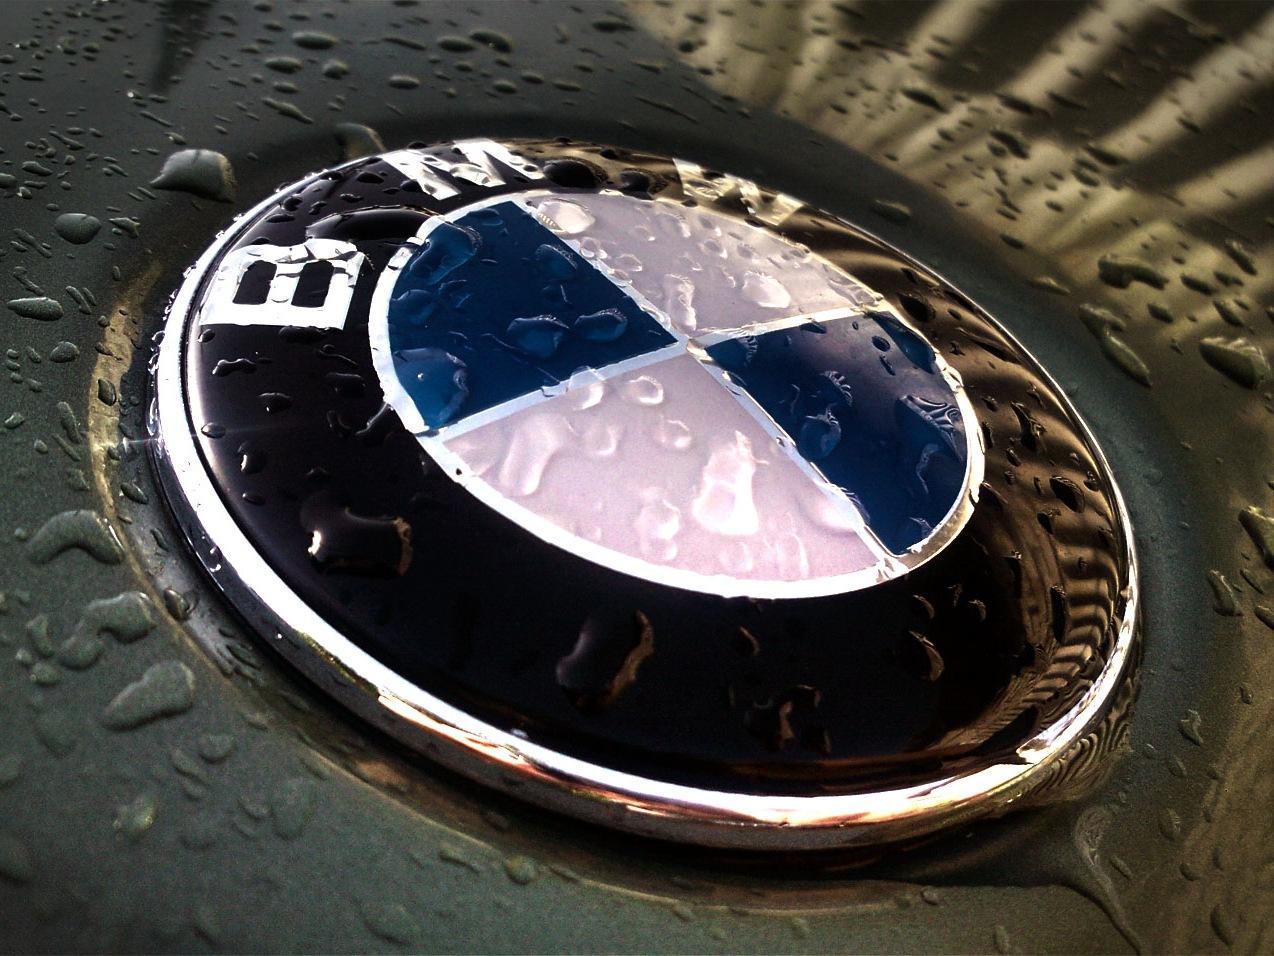 Bmw Logo Wallpaper Hd For Mobile Many Hd Wallpaper